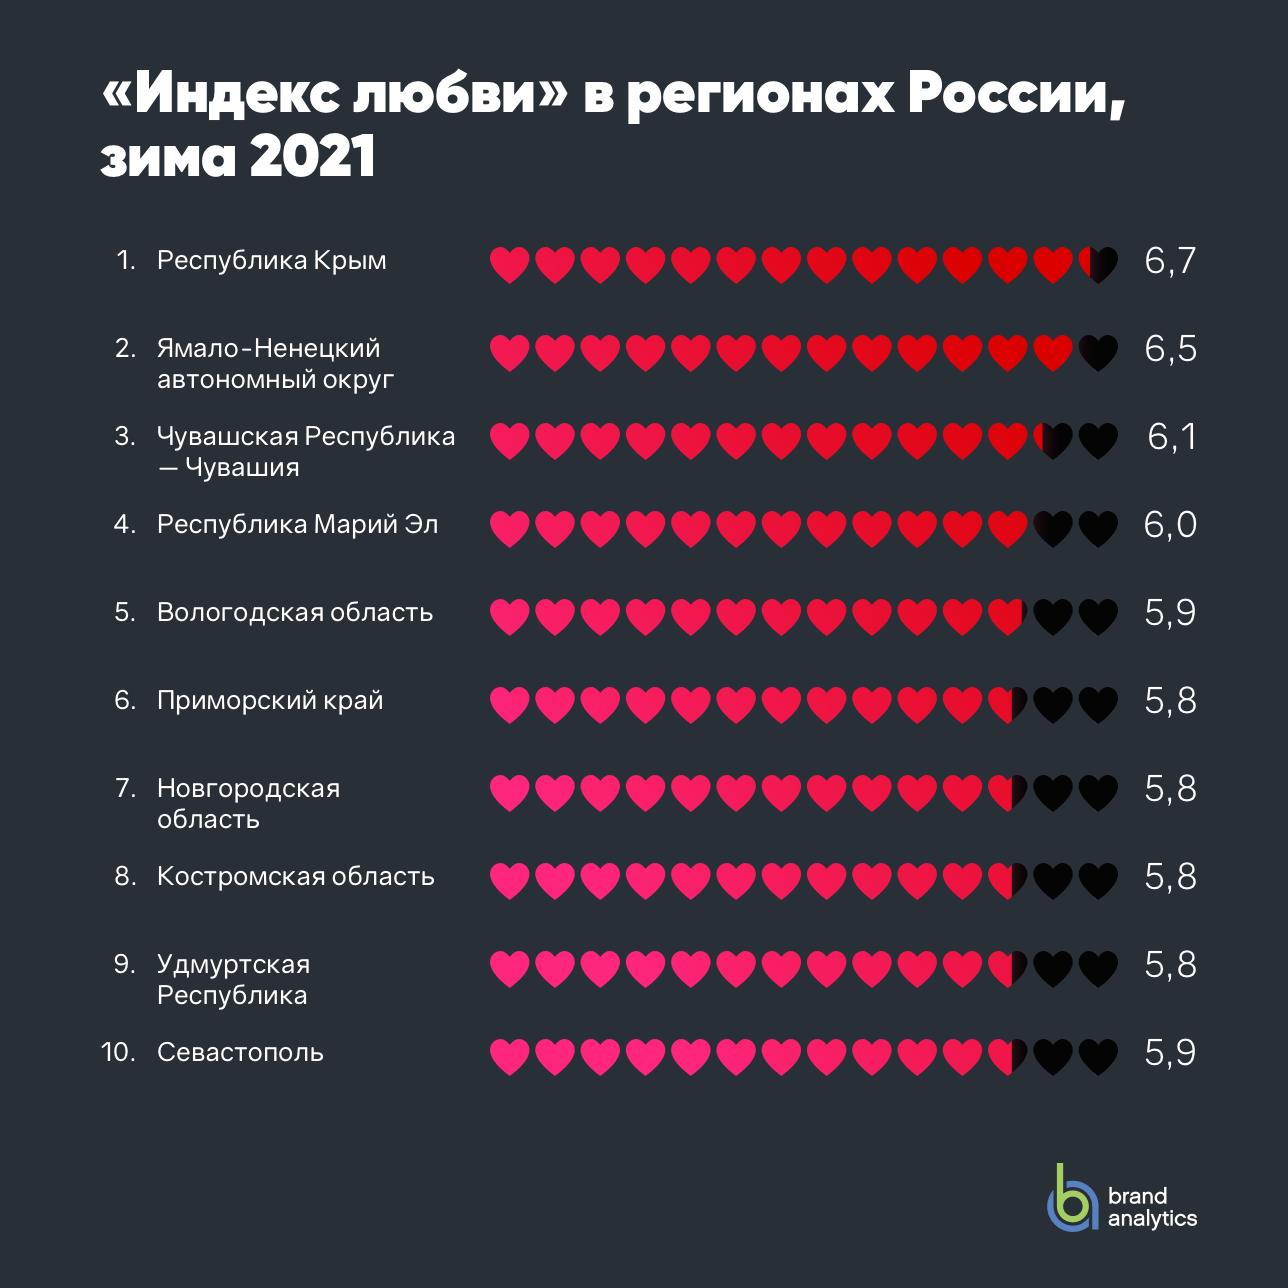 Индекс любви